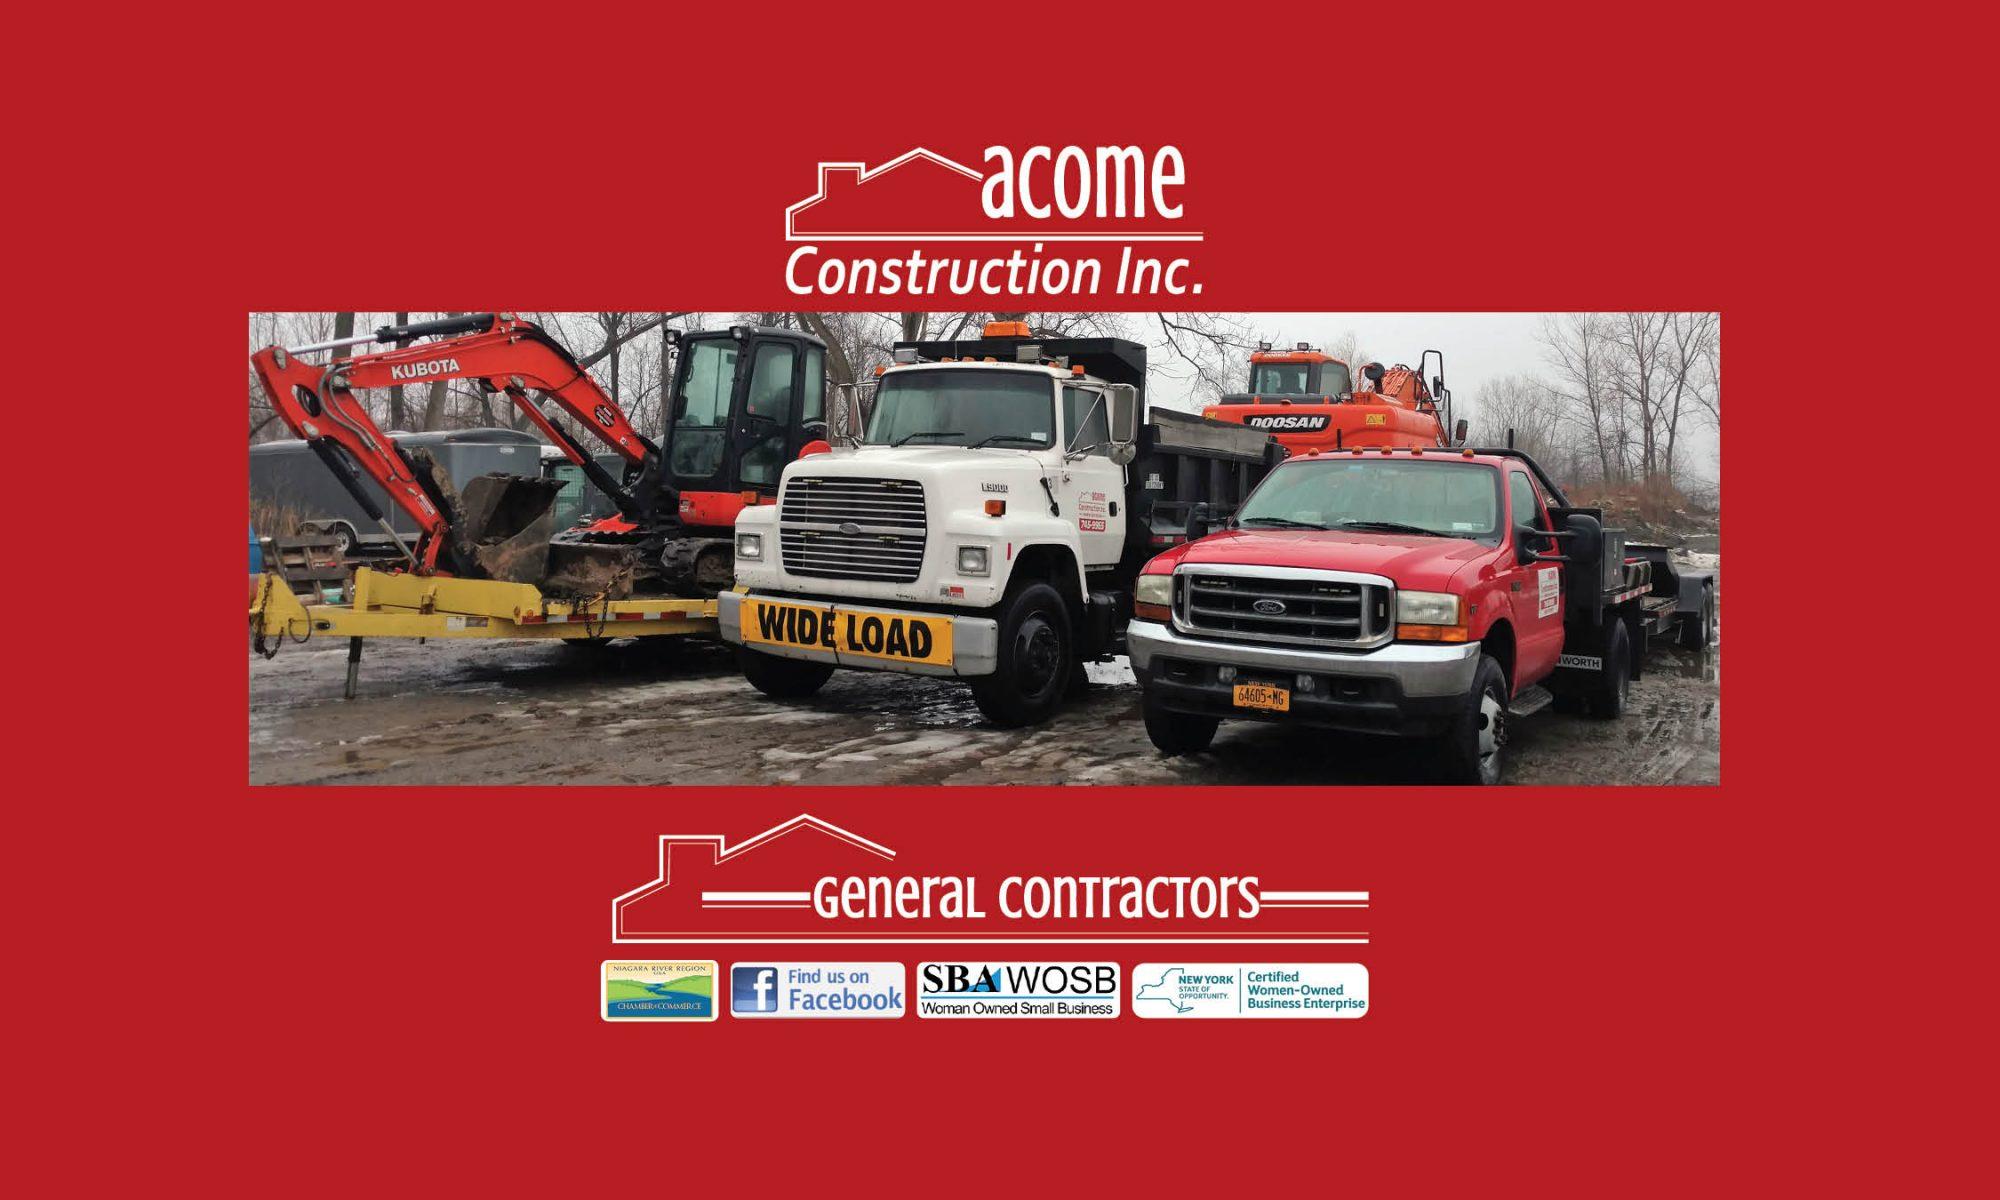 Acome Construction